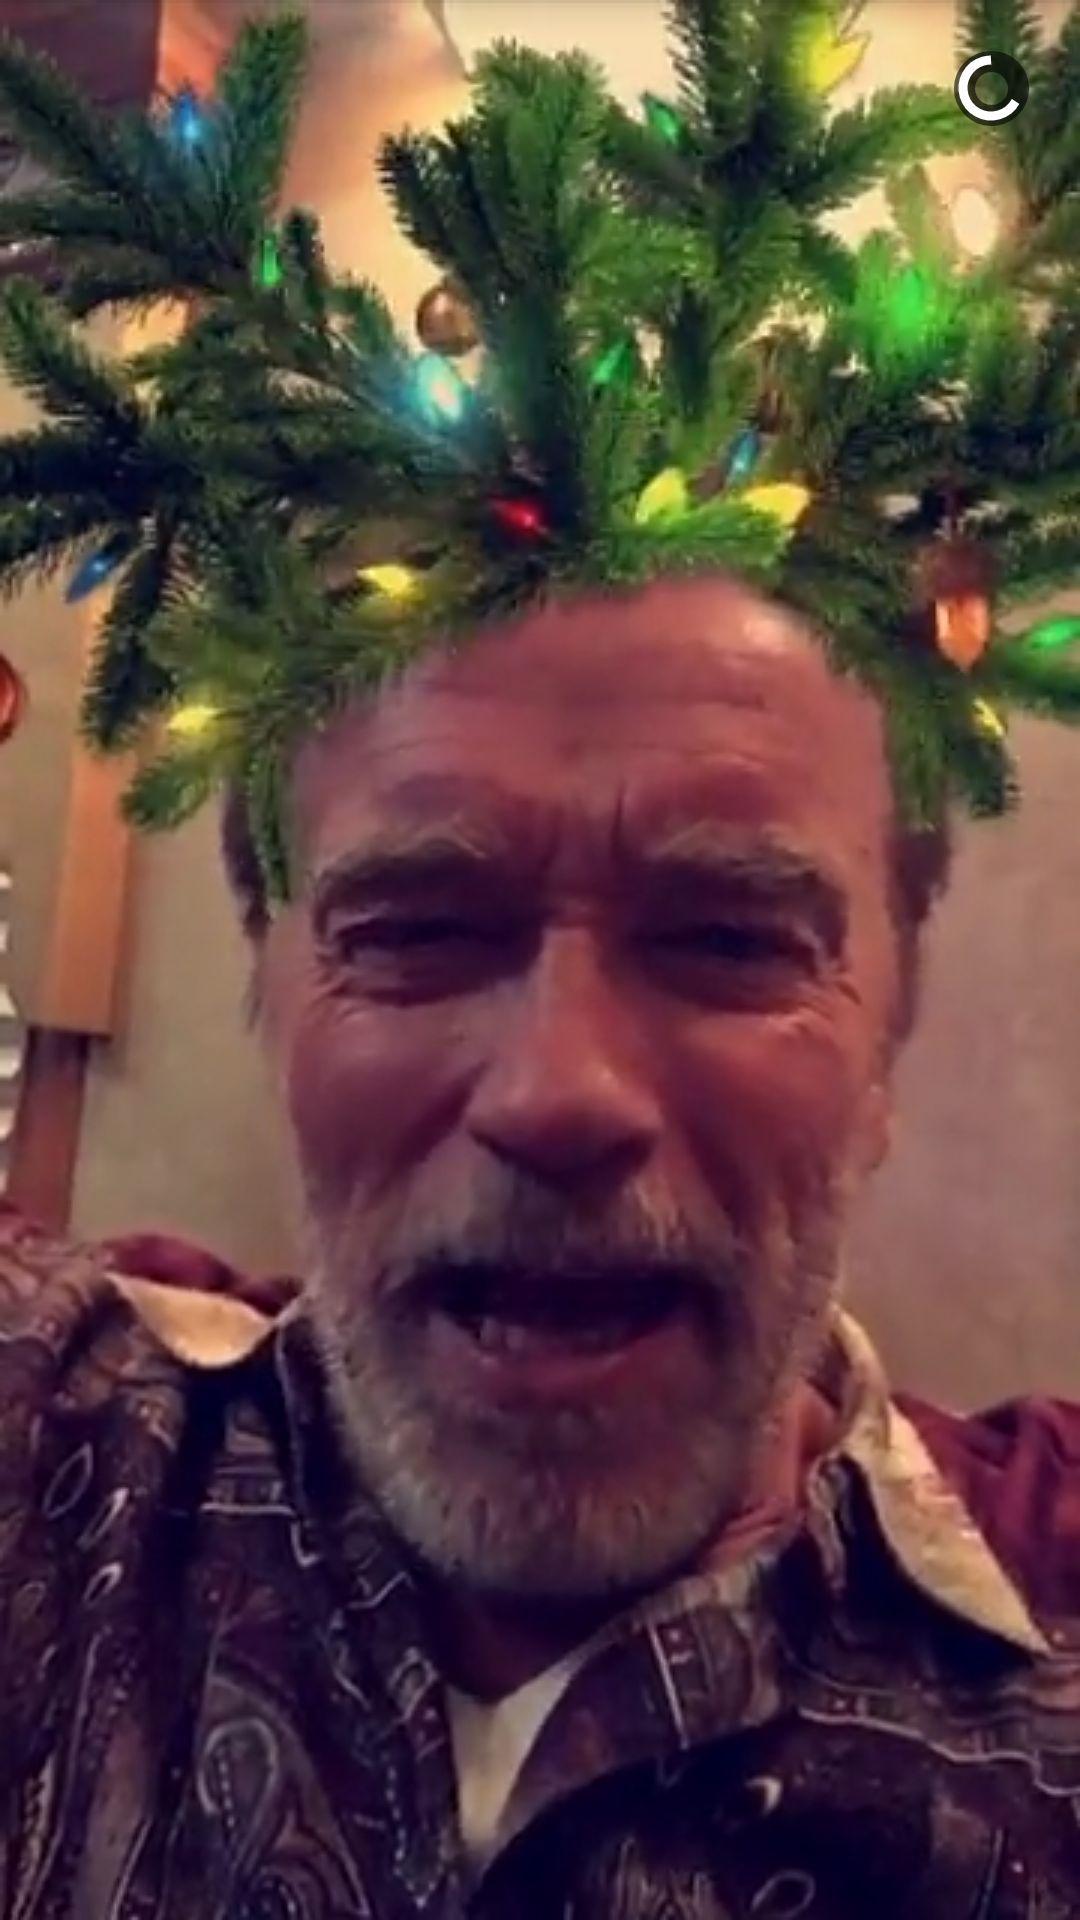 Download Free Arnold Schwarzenegger Iphone Wallpaper